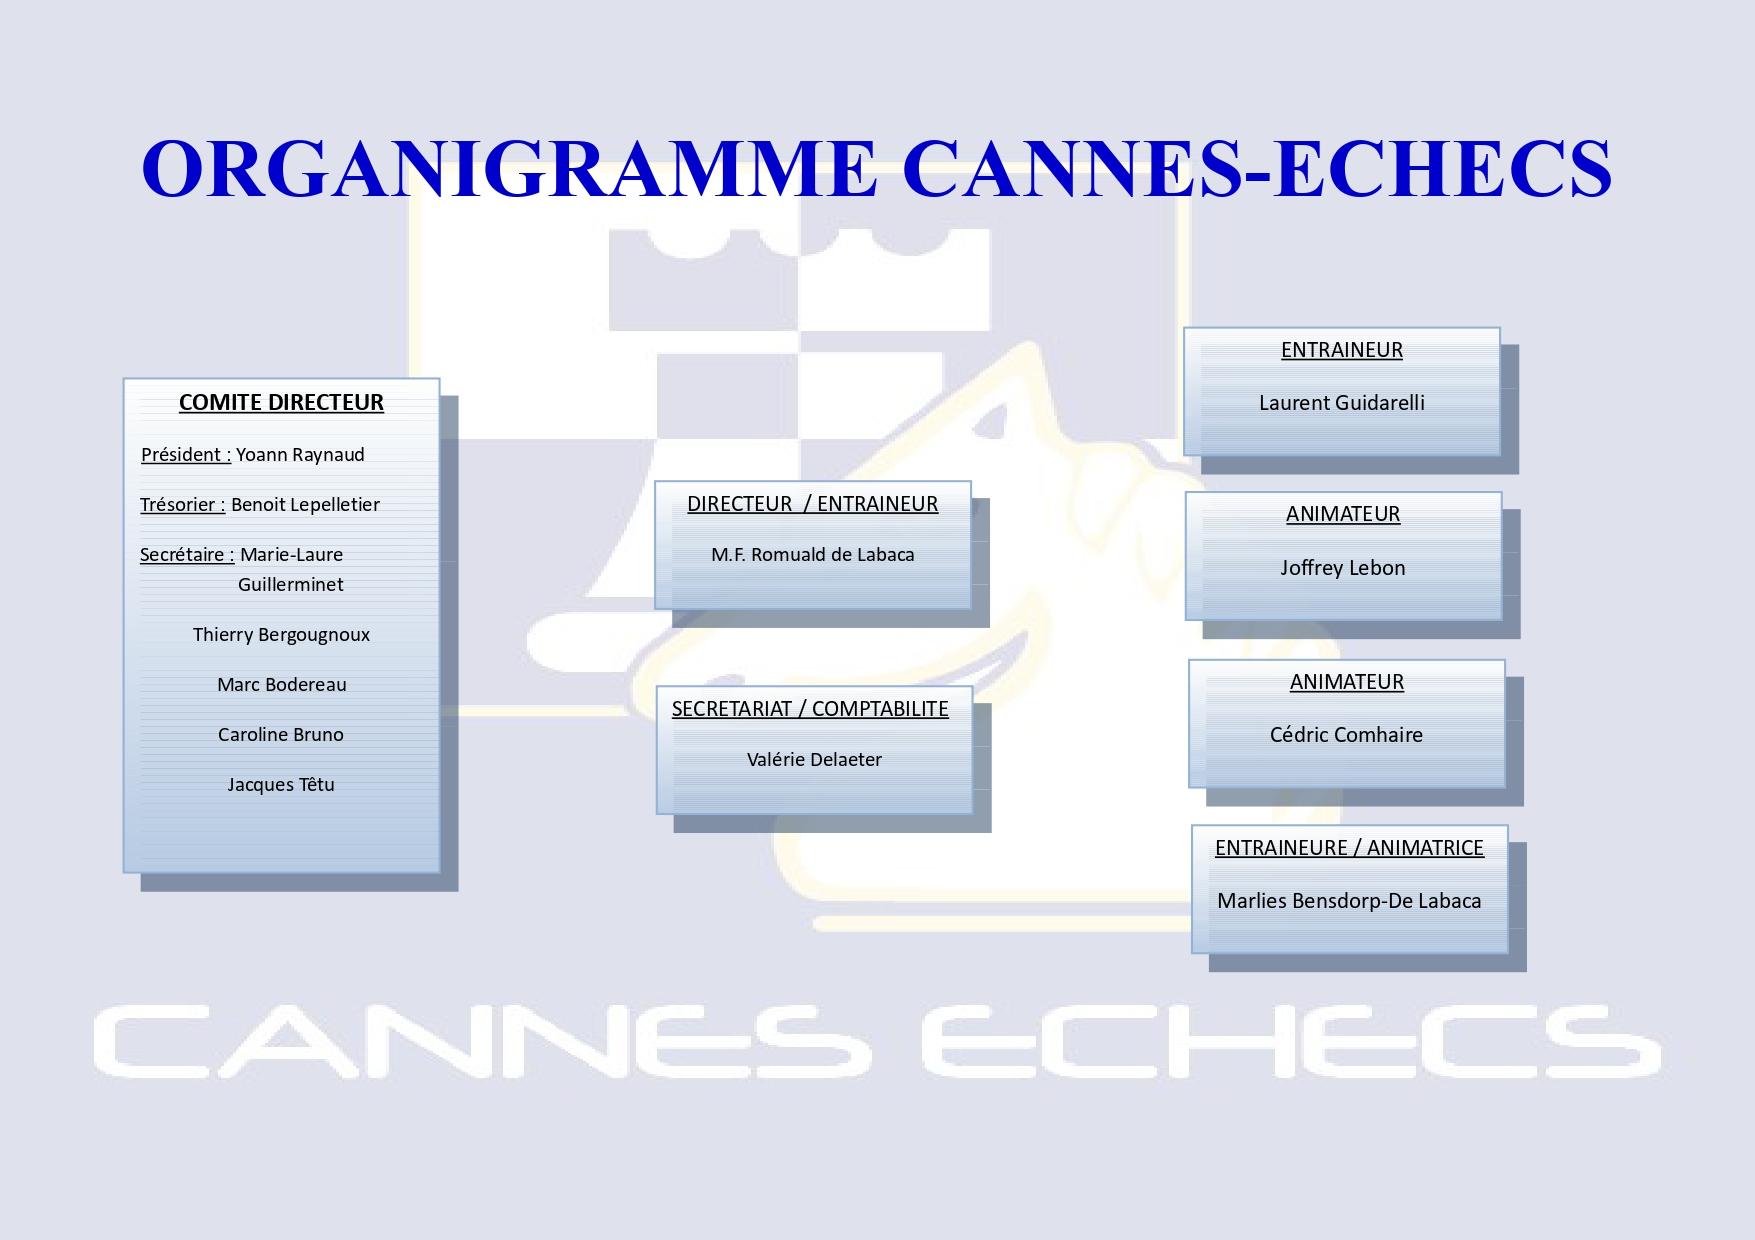 Organigramme Cannes Echecs